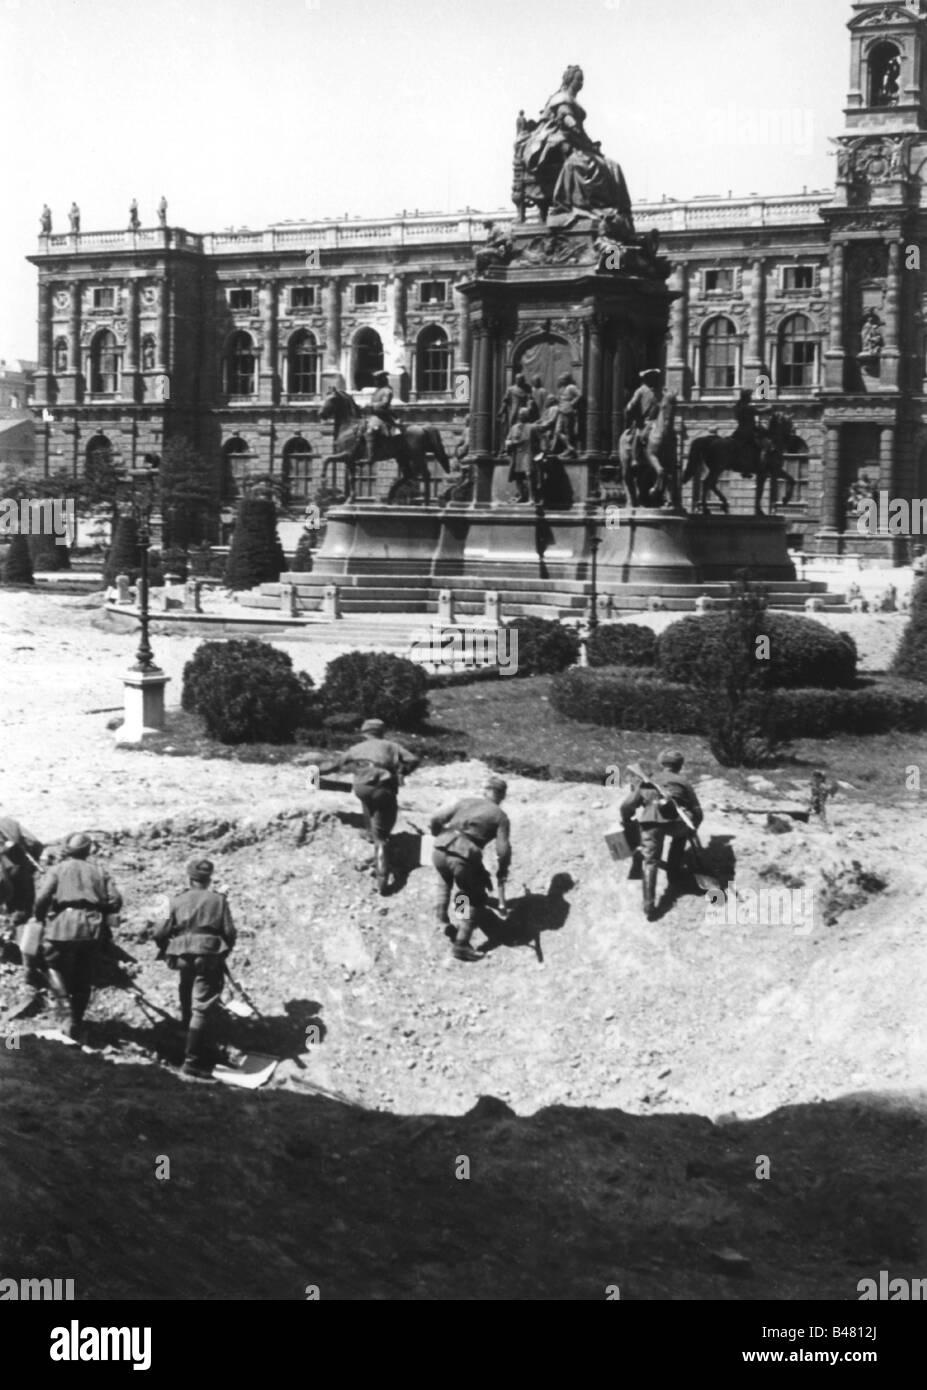 events, Second World War / WWII, Austria, end of war, Vienna 1945, Stock Photo